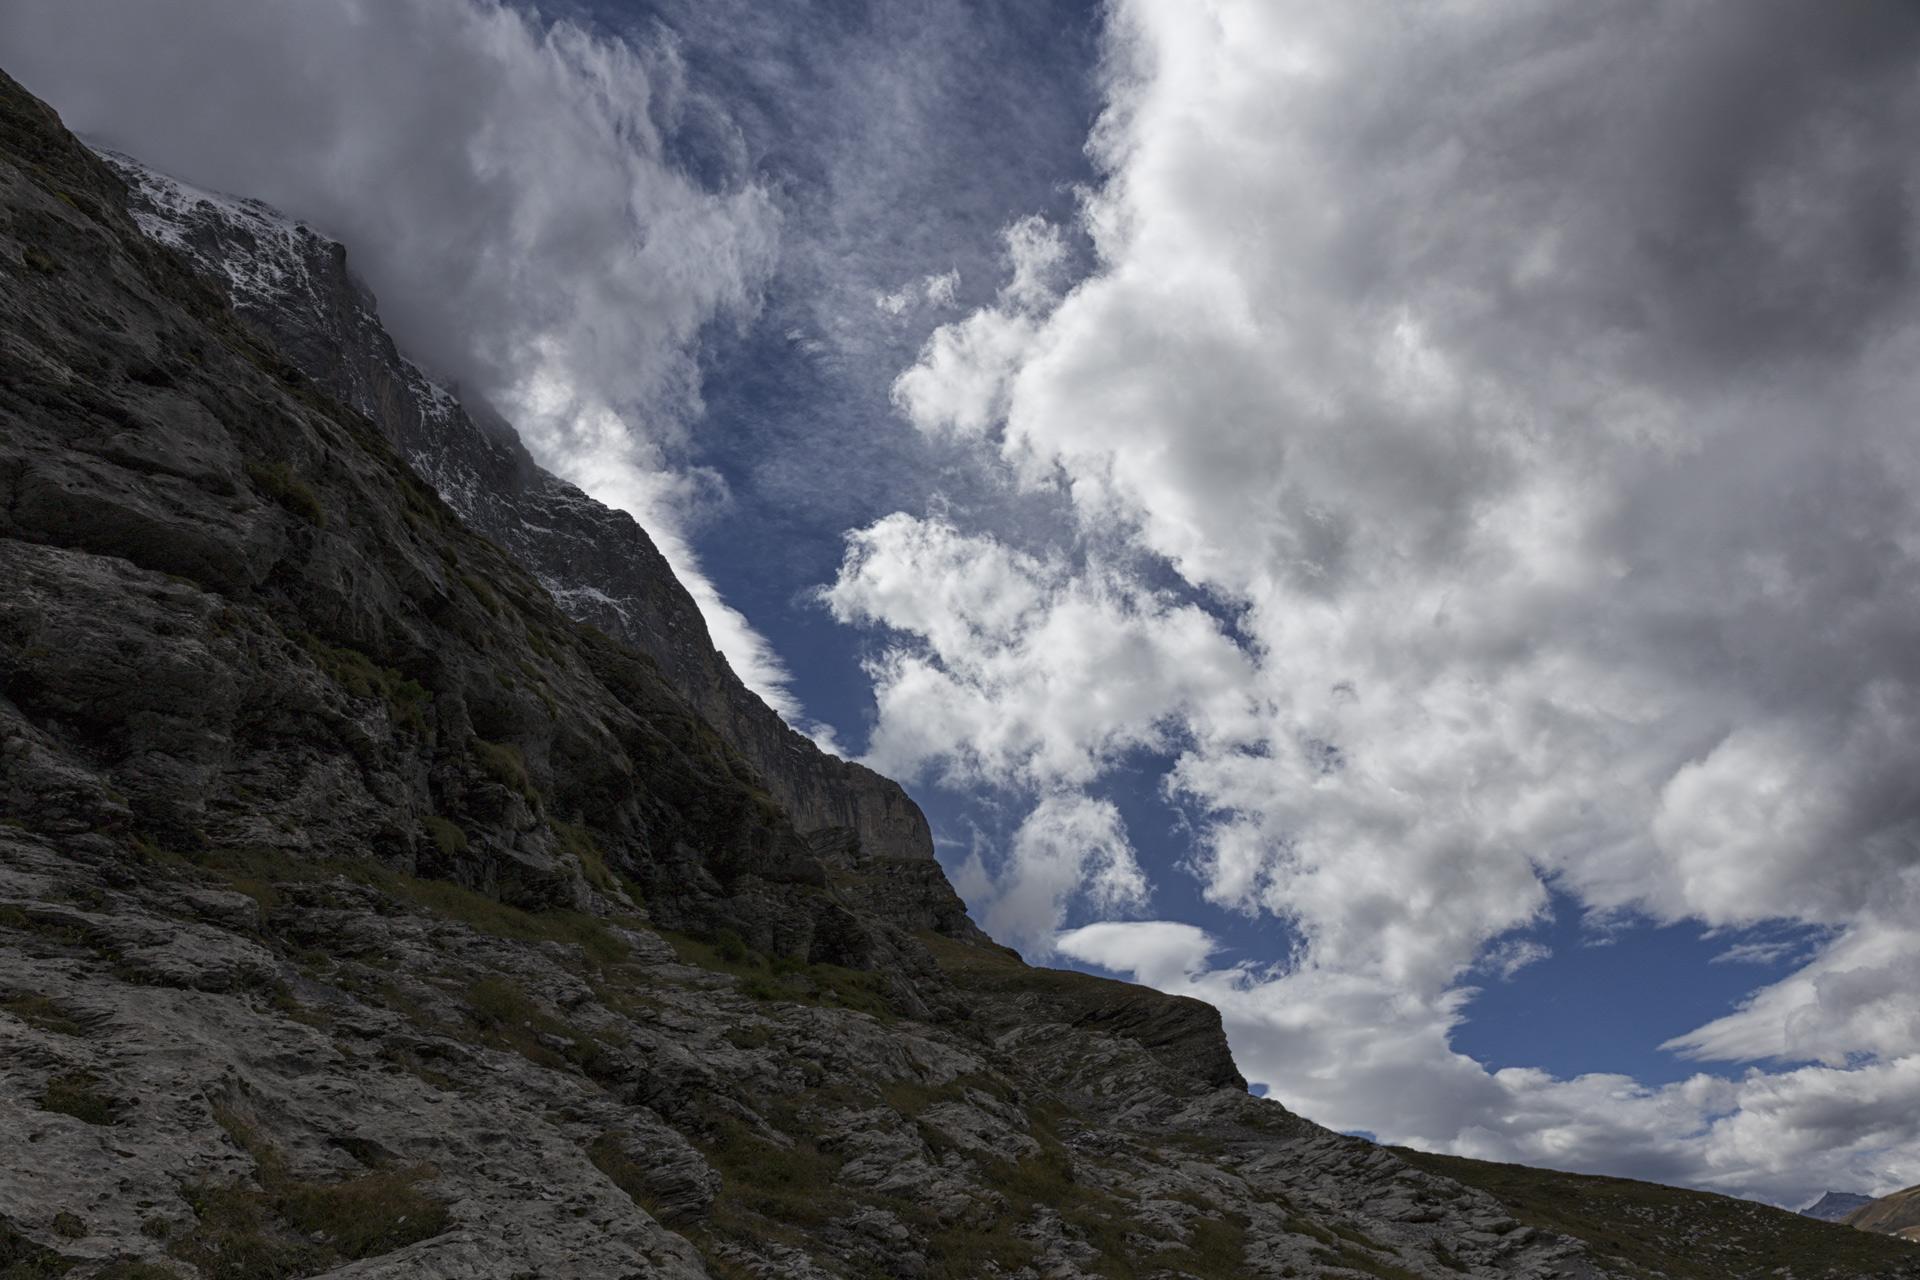 Berner-Oberland_20150916_0077-1